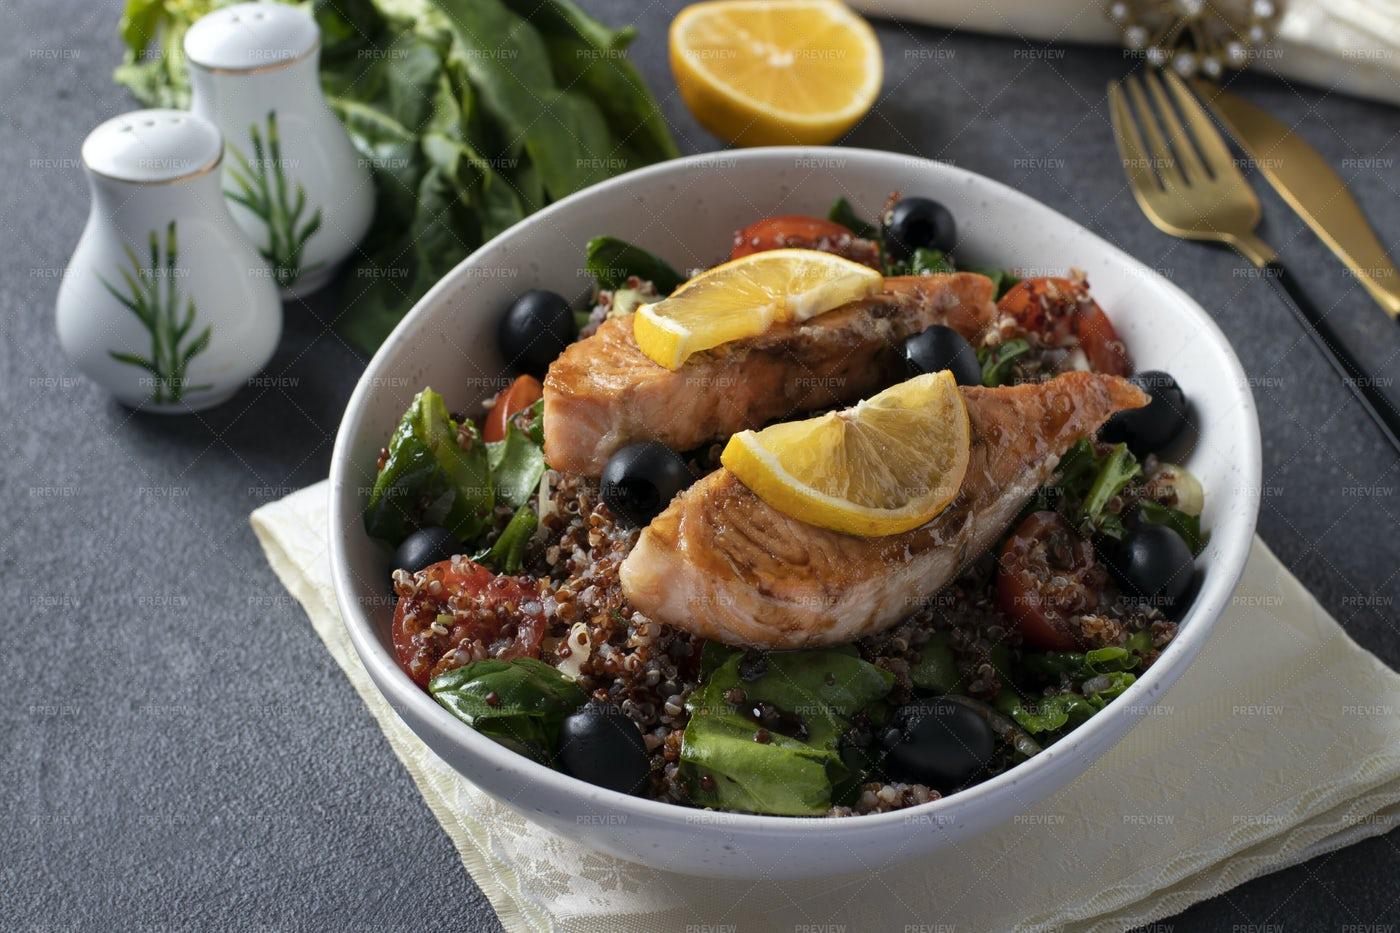 Salad With Quinoa And Salmon: Stock Photos